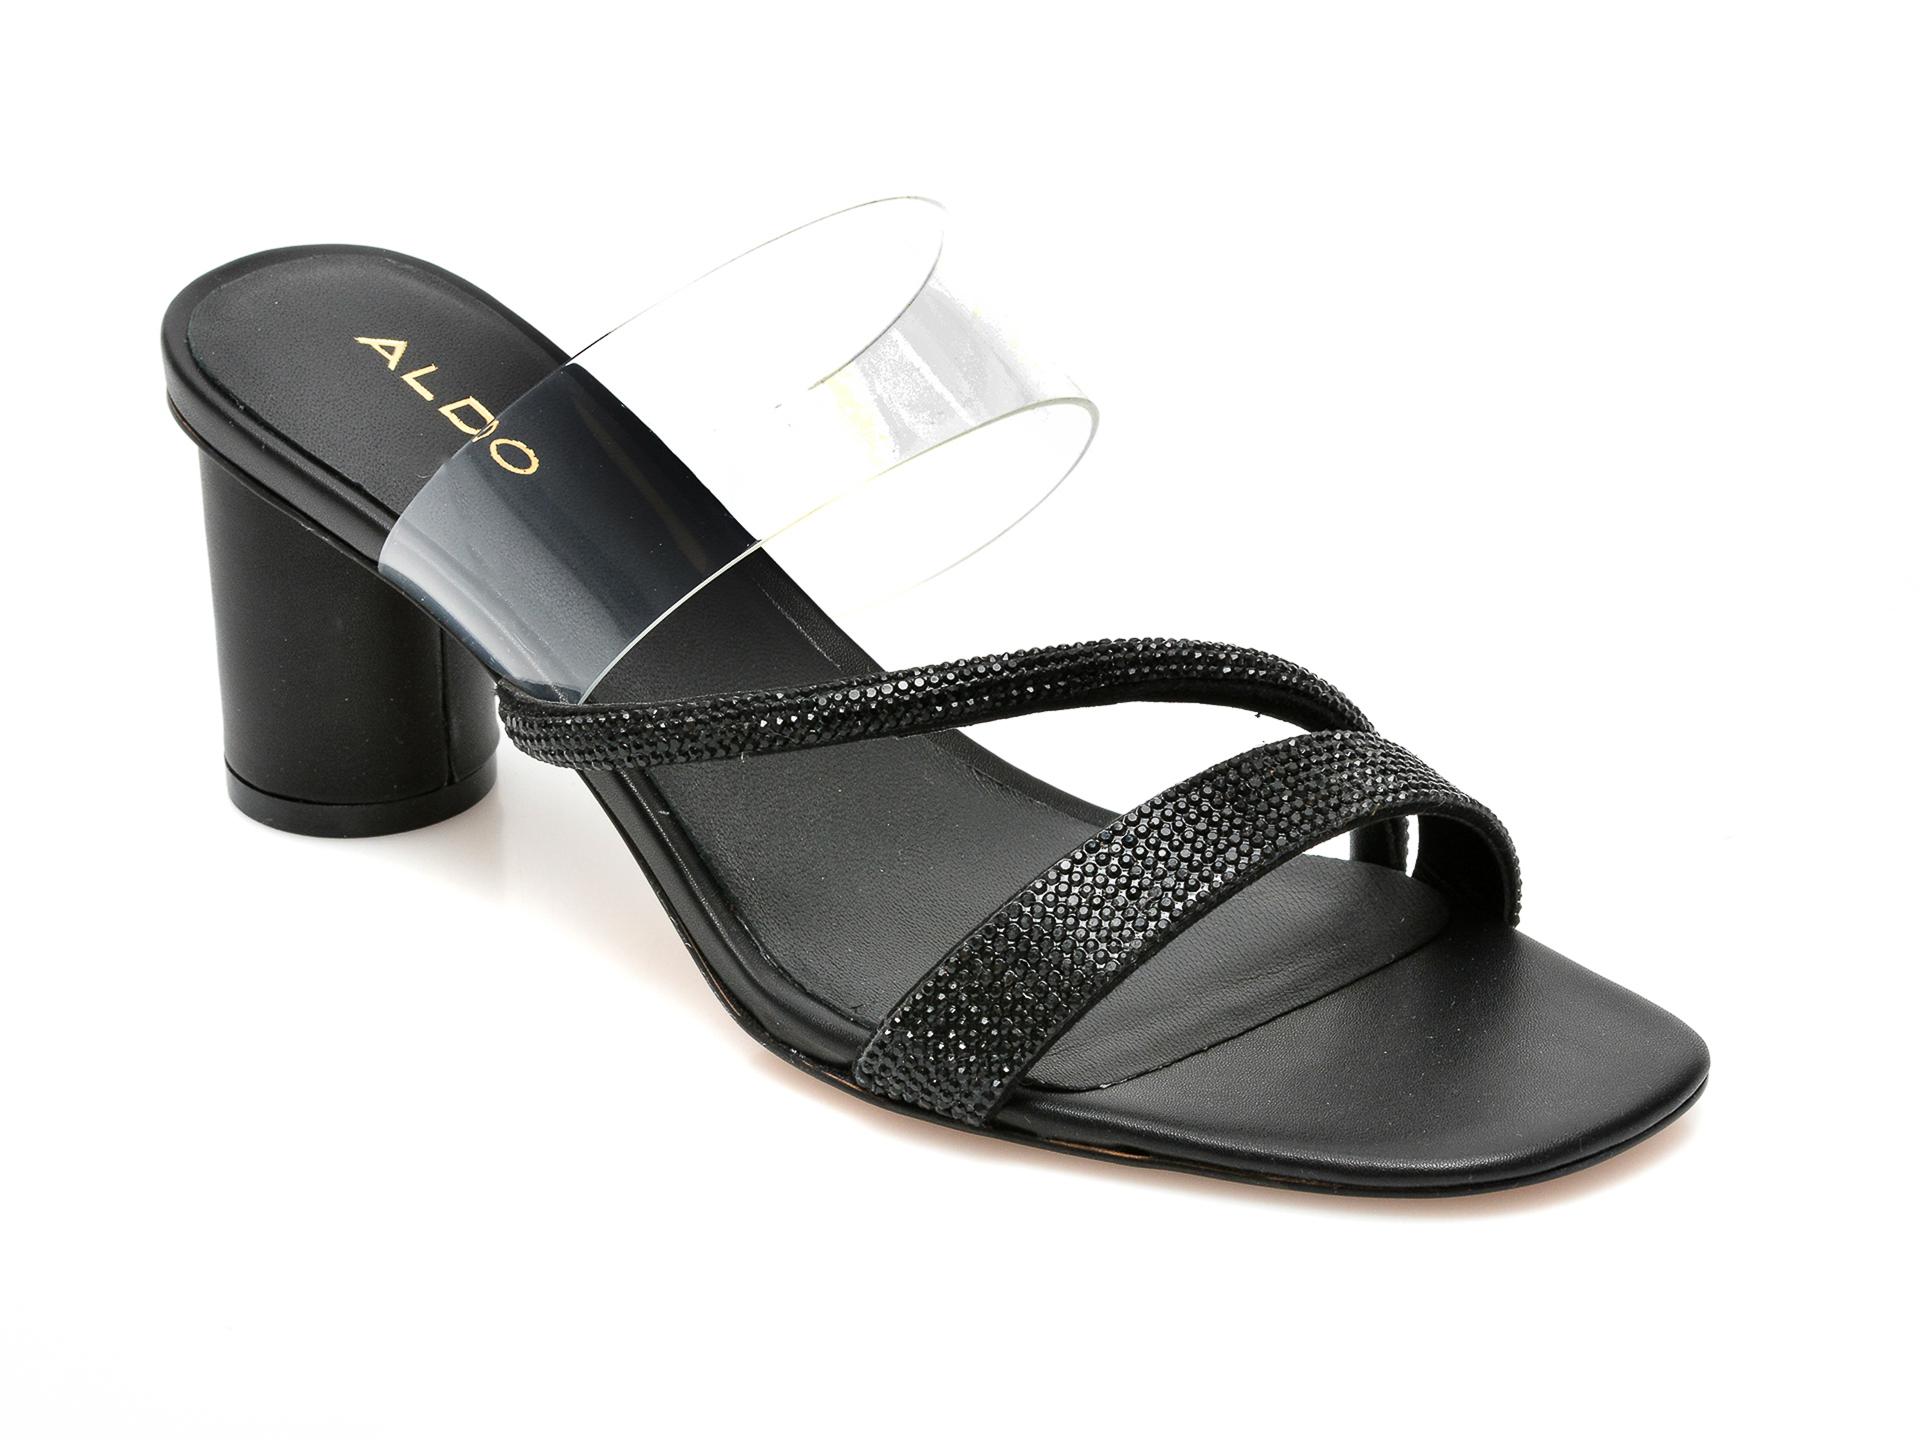 Papuci ALDO negre, Muralis001, din piele ecologica imagine otter.ro 2021